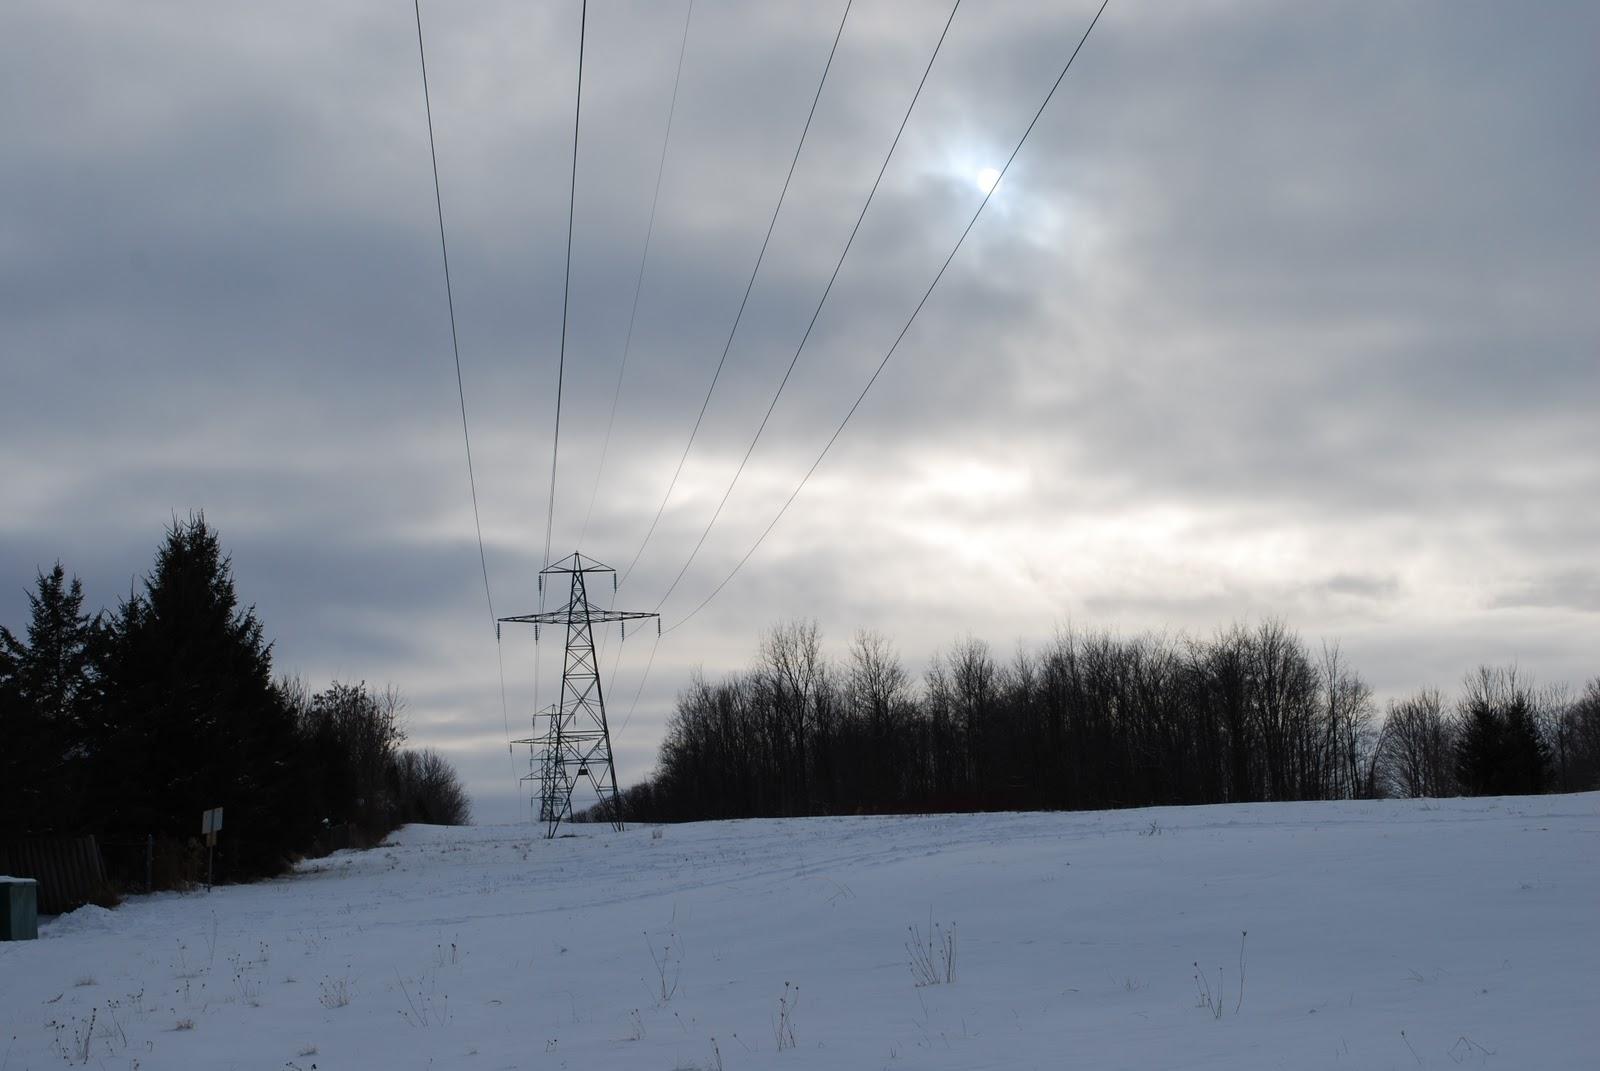 230KV power lines